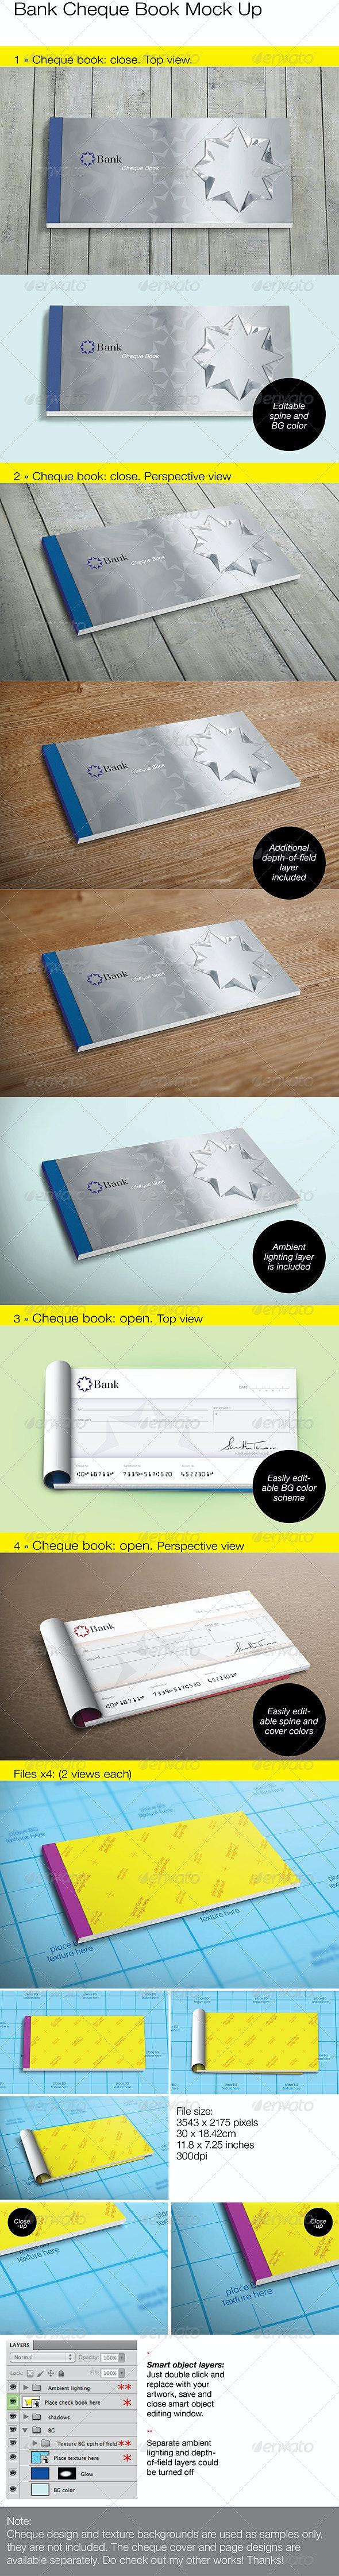 Bank Cheque/Check Book Mock Up - Miscellaneous Print